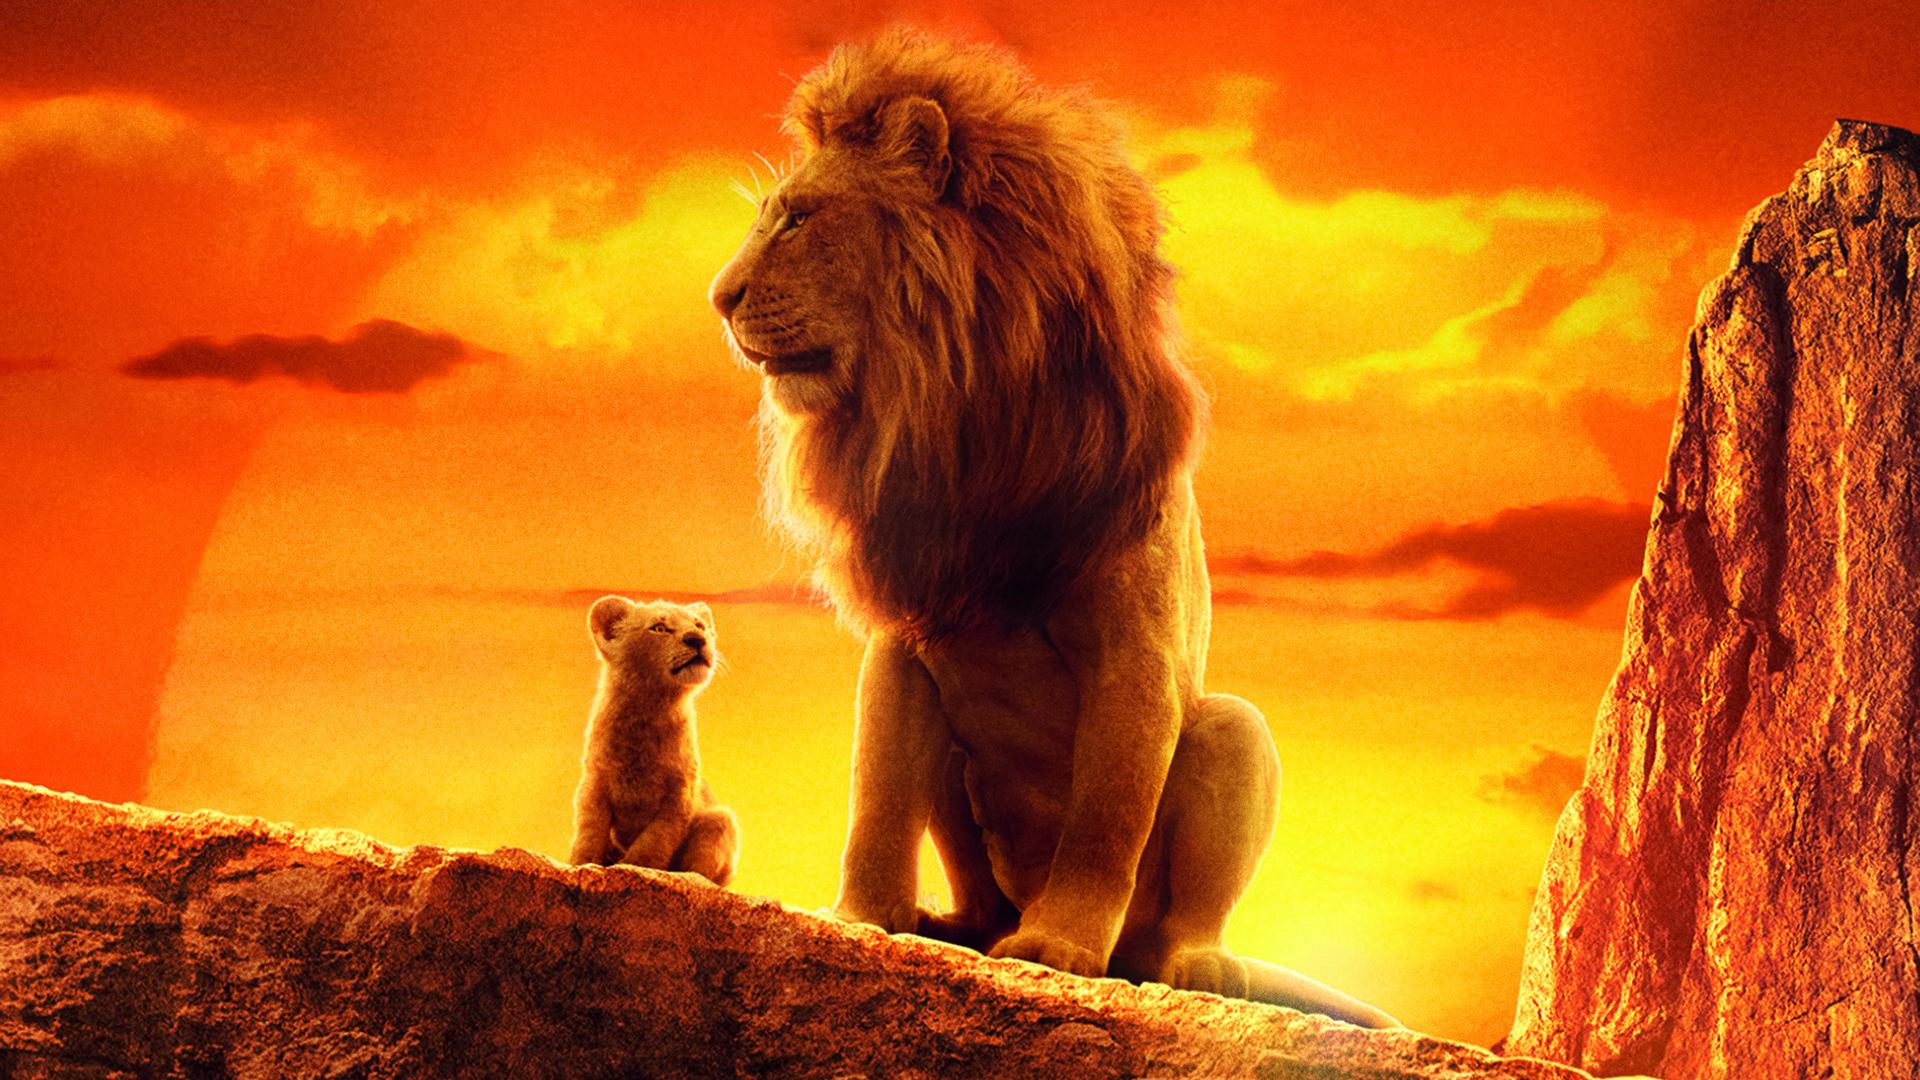 1920x1080 The Lion King 2019 4k Movie Laptop Full HD 1080P ...